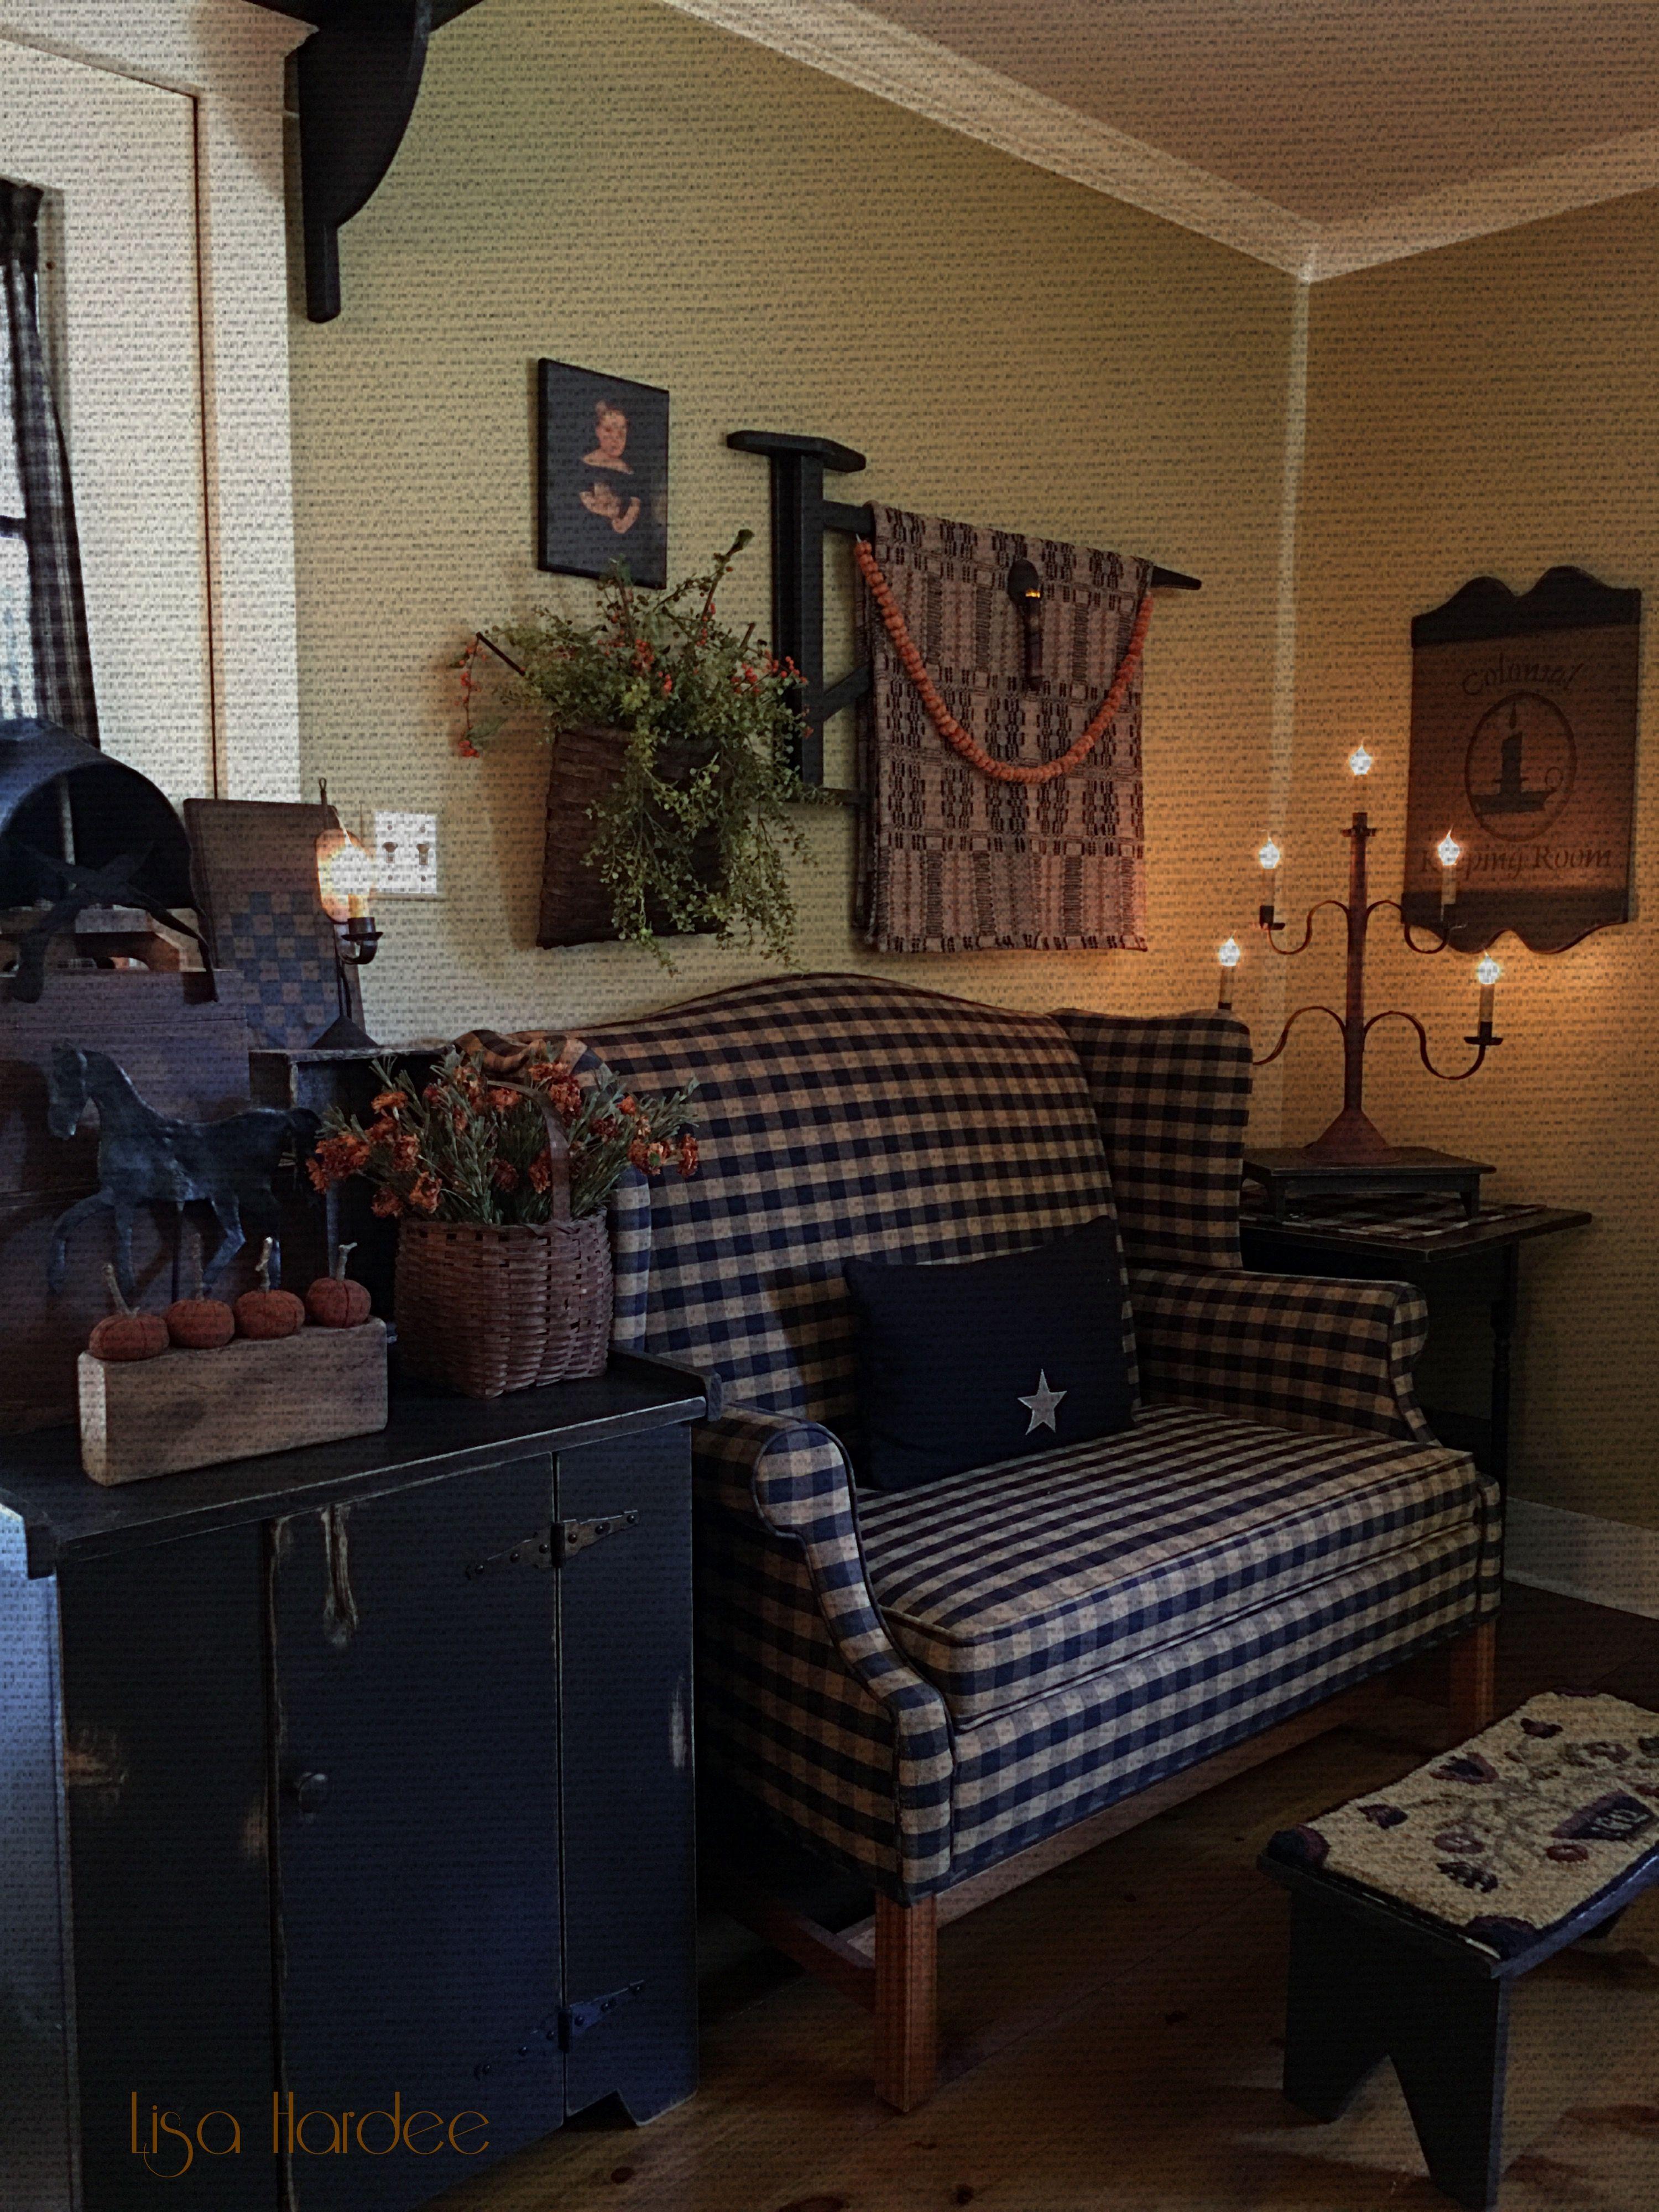 Pin On Primitive Decorating Around My House Lisa Hardee #primitive #decor #living #room